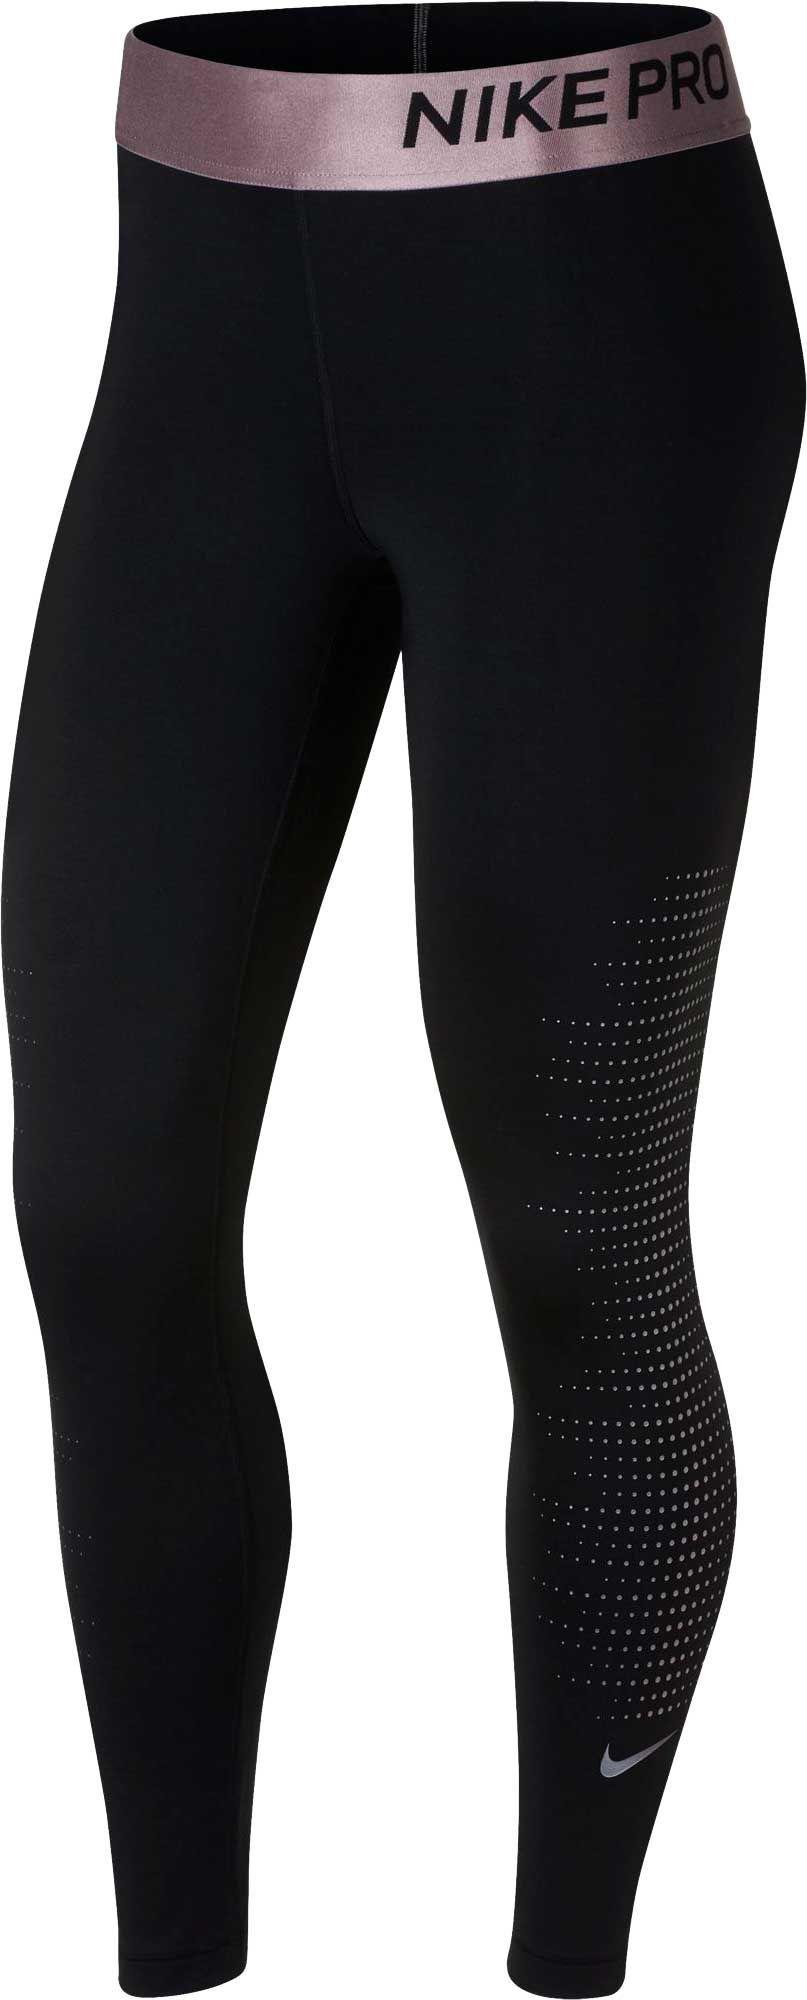 60e20707ef4151 Nike Women's Pro Warm Training Tights | Products | Nike women ...